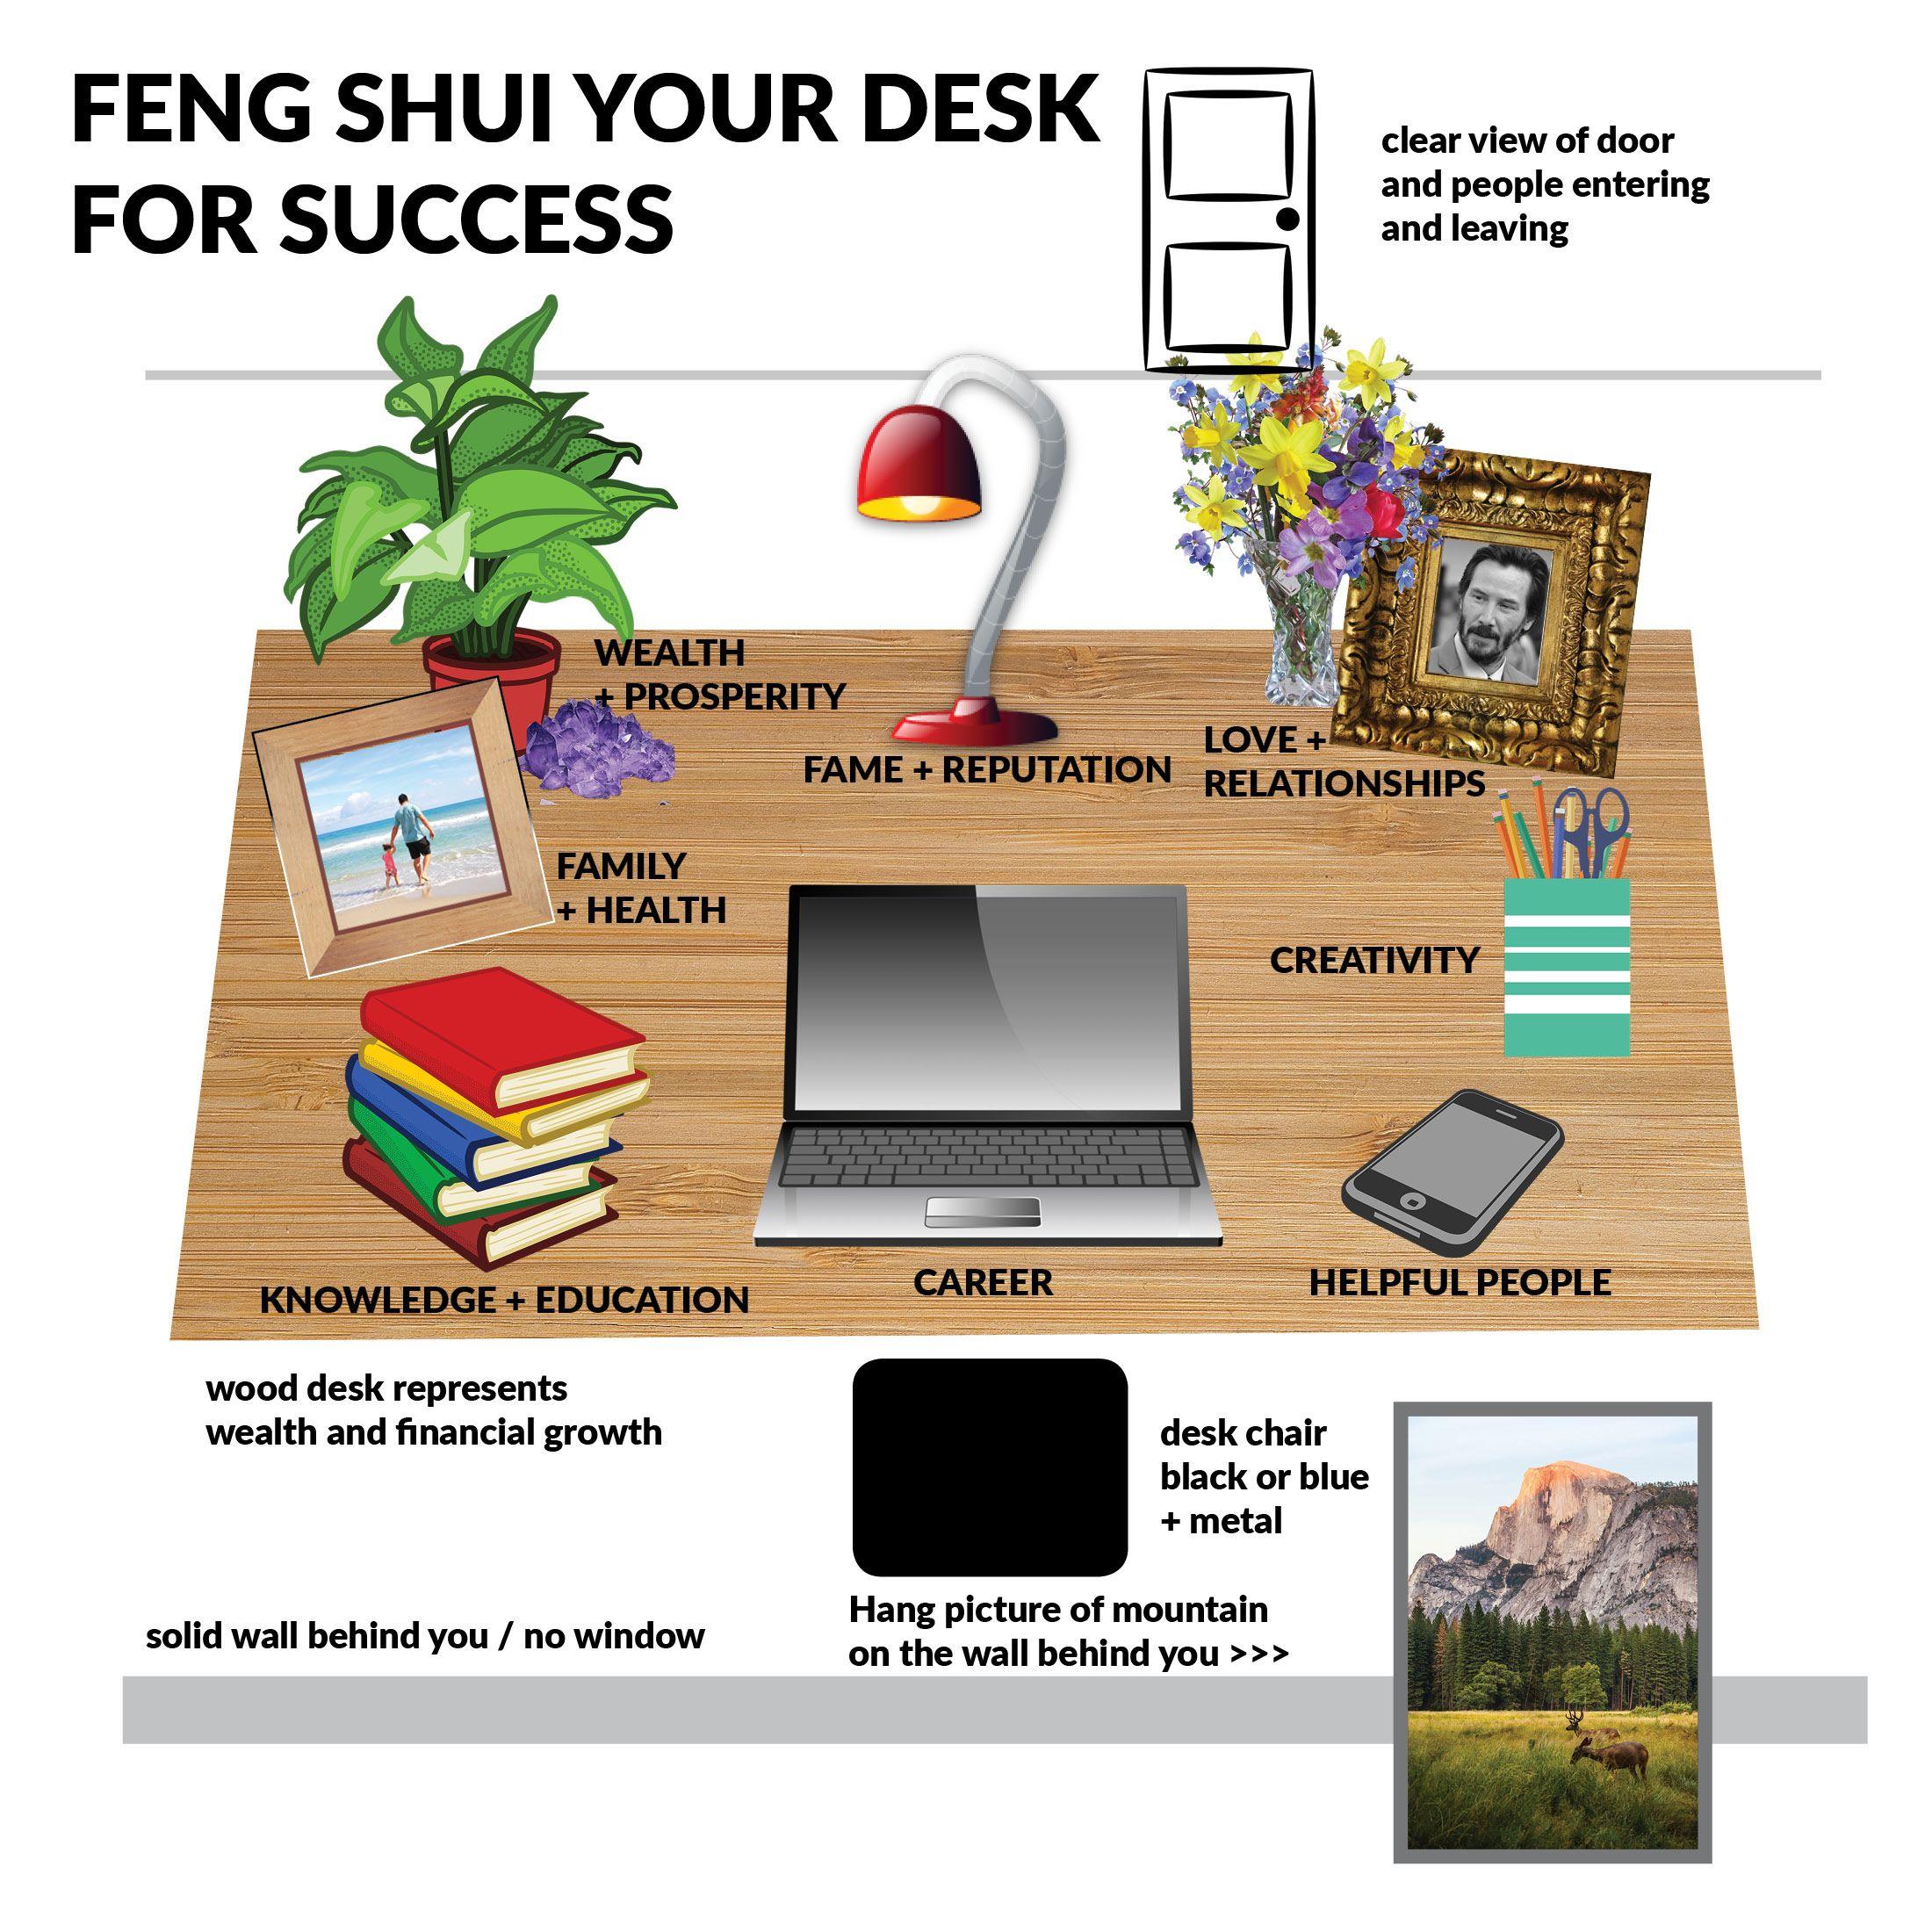 Feng Shui your Desk for Success